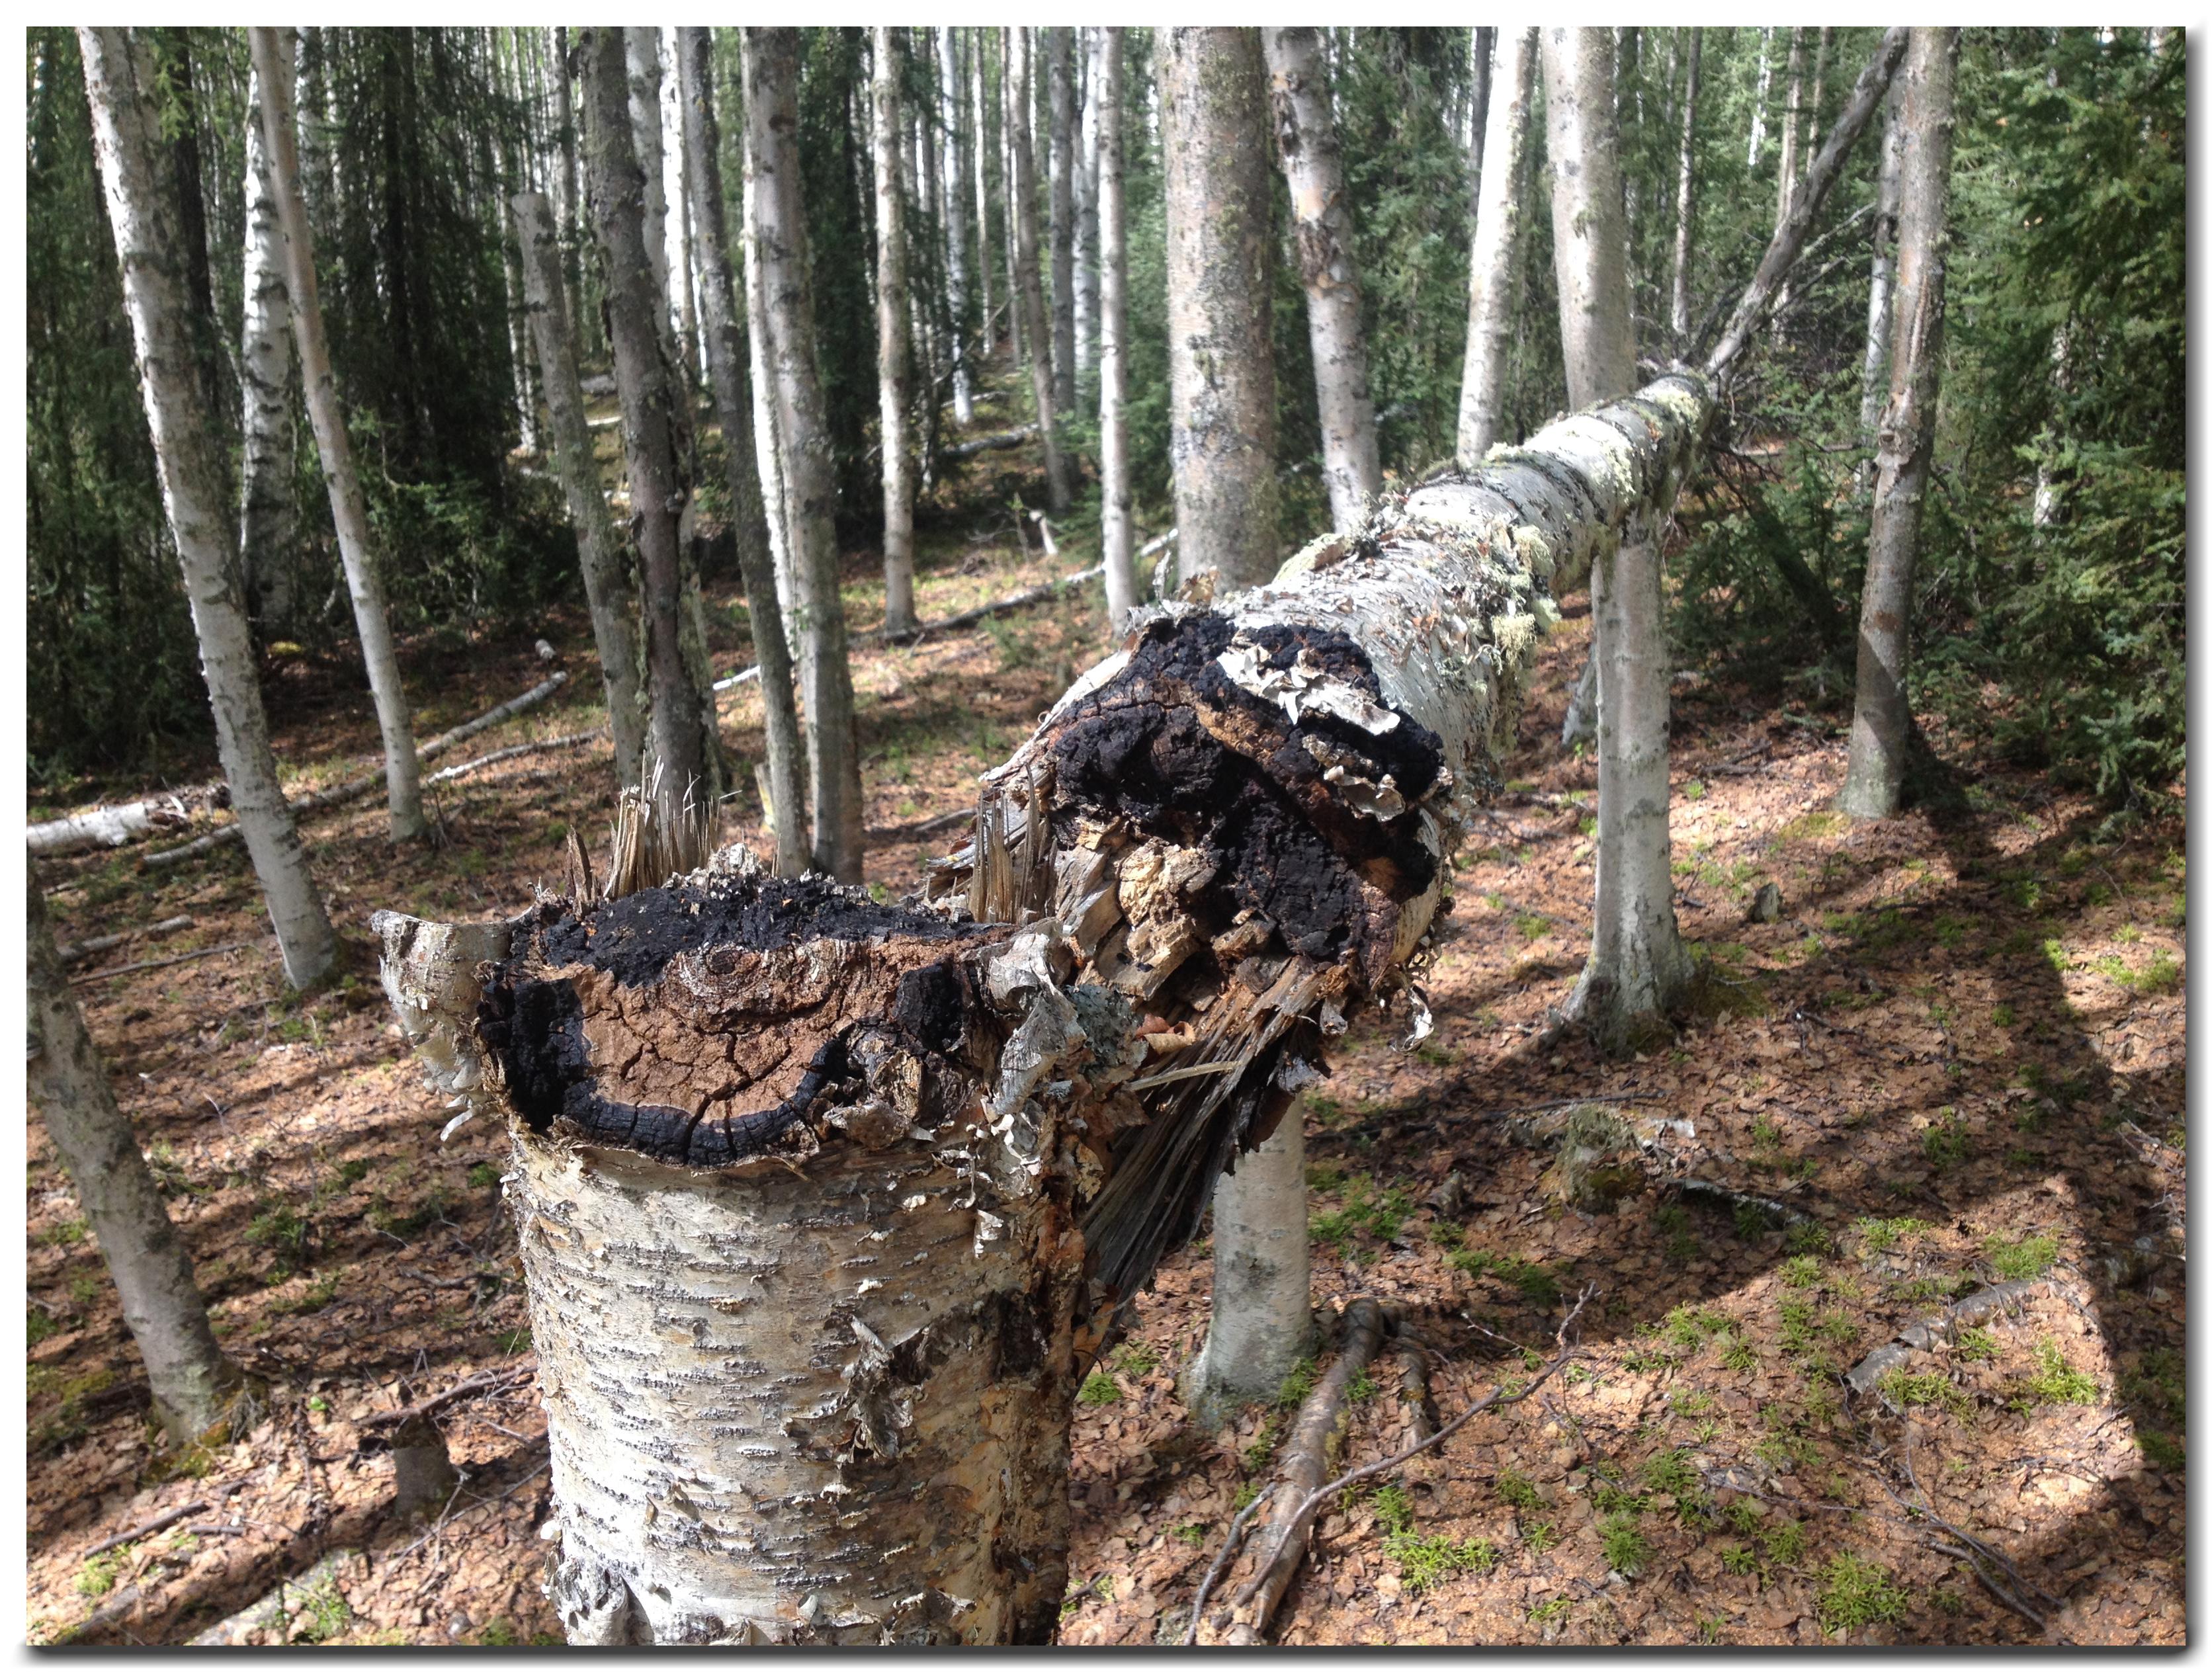 Wild Alaska Chaga Fallen Birch Tree